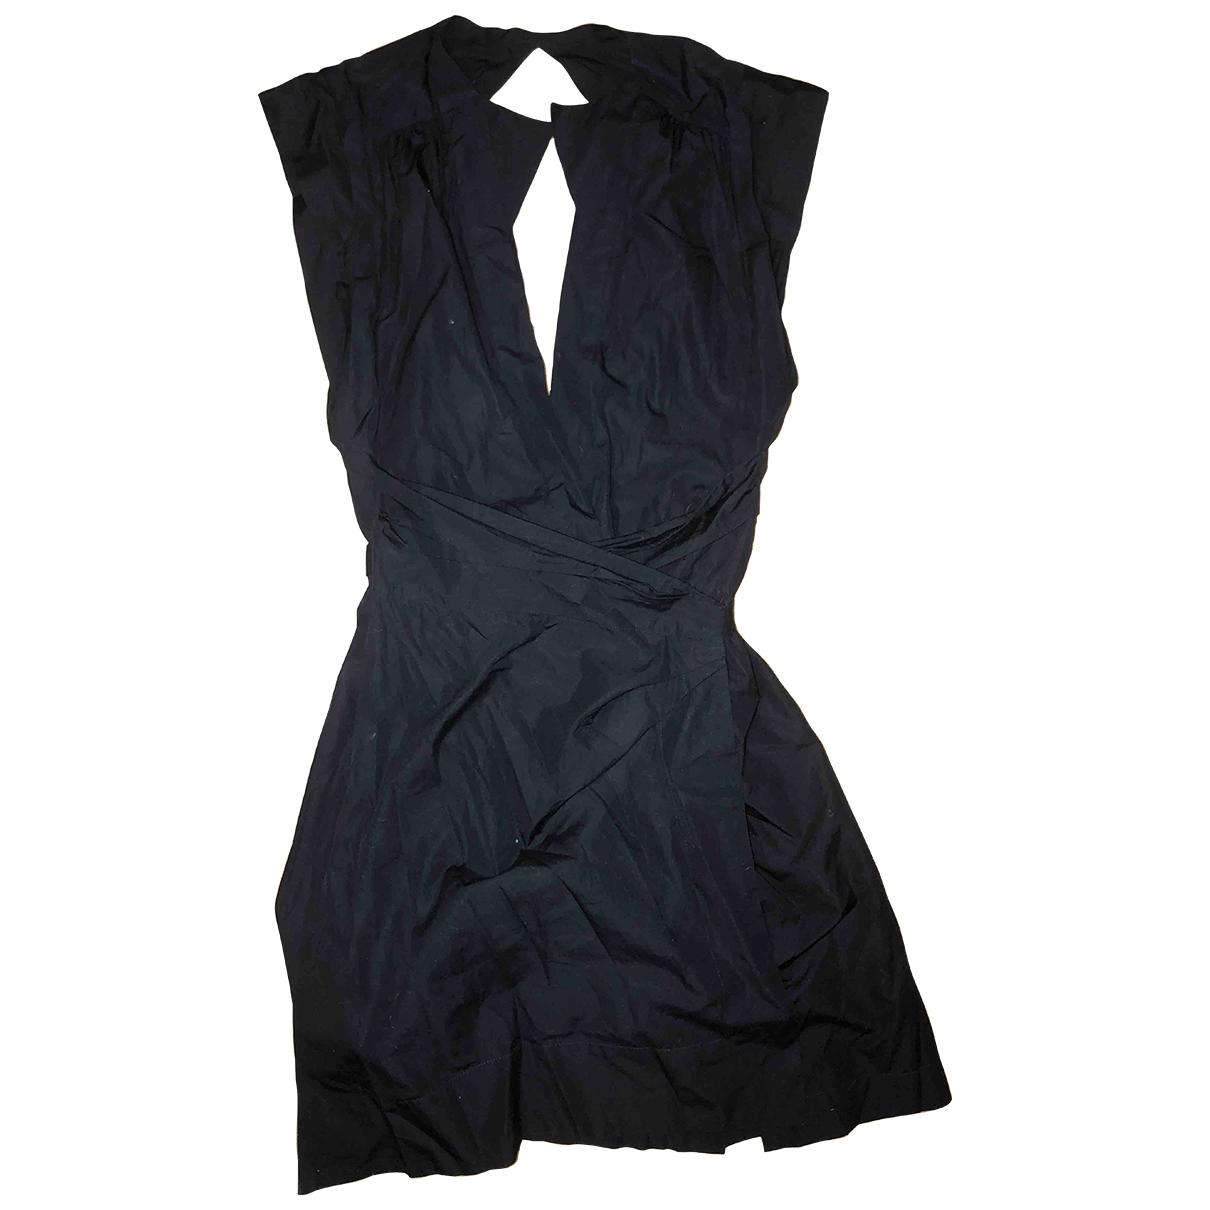 Isabel Marant \N Black Cotton dress for Women 40 FR